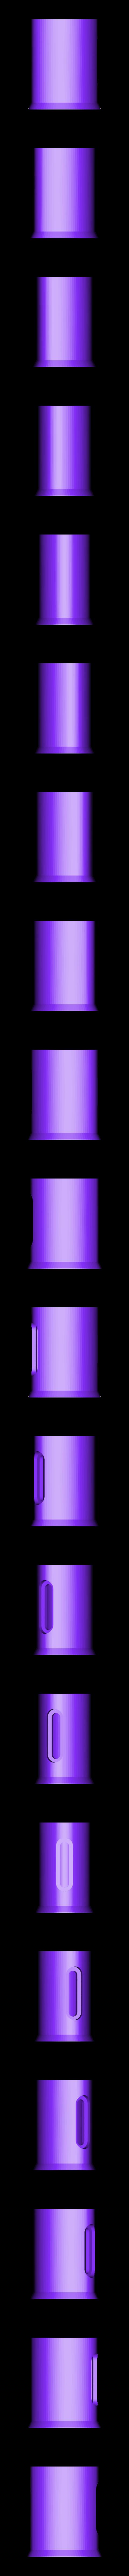 Support radiateur douche corps 2.STL Download STL file Shower radiator holder • 3D printable design, Jorony